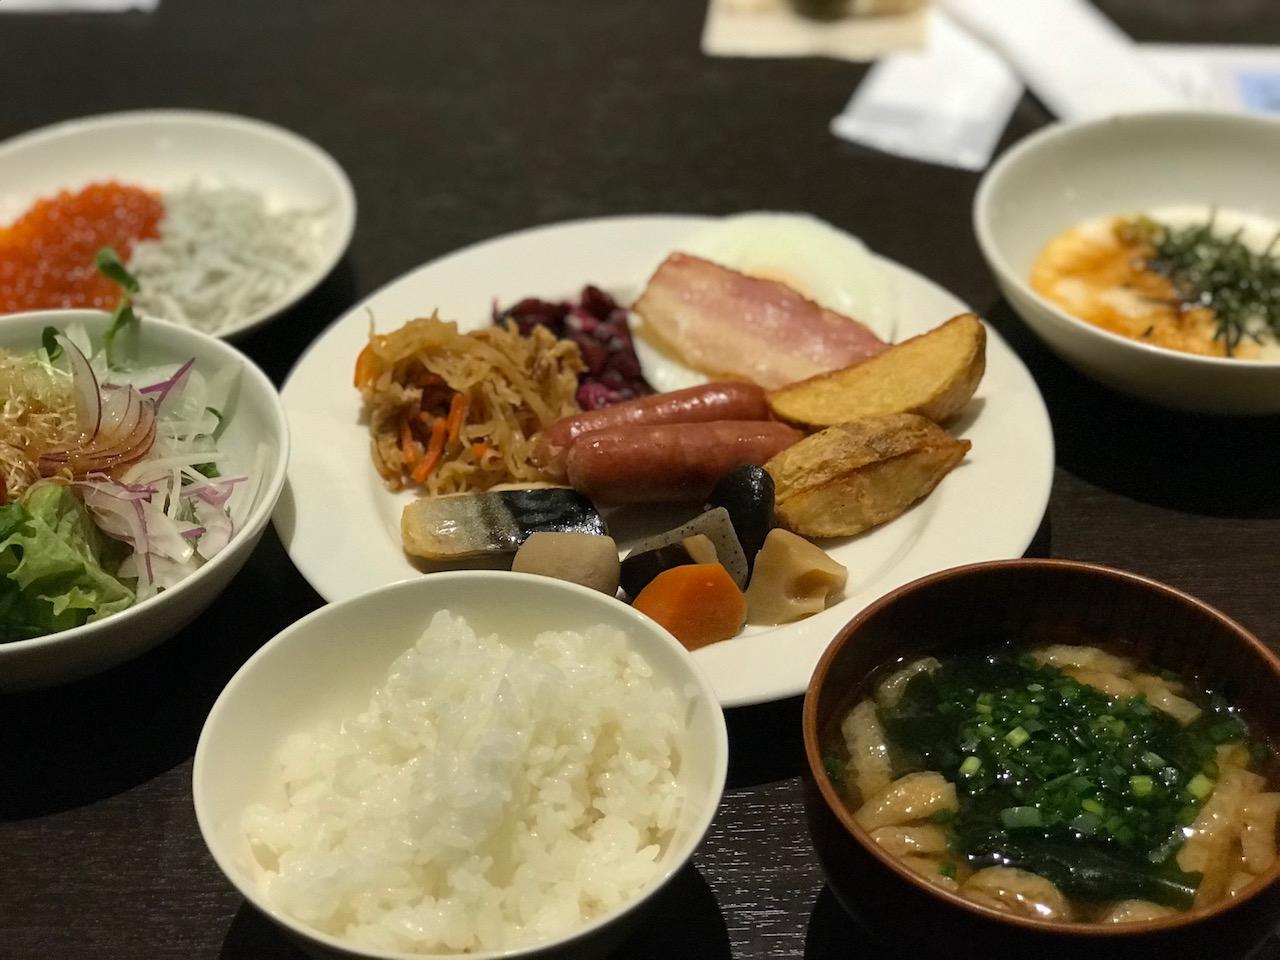 【JALシティ羽田・はるほろ@穴守稲荷】朝食ブッフェはメニュー豊富でコスパが良い!